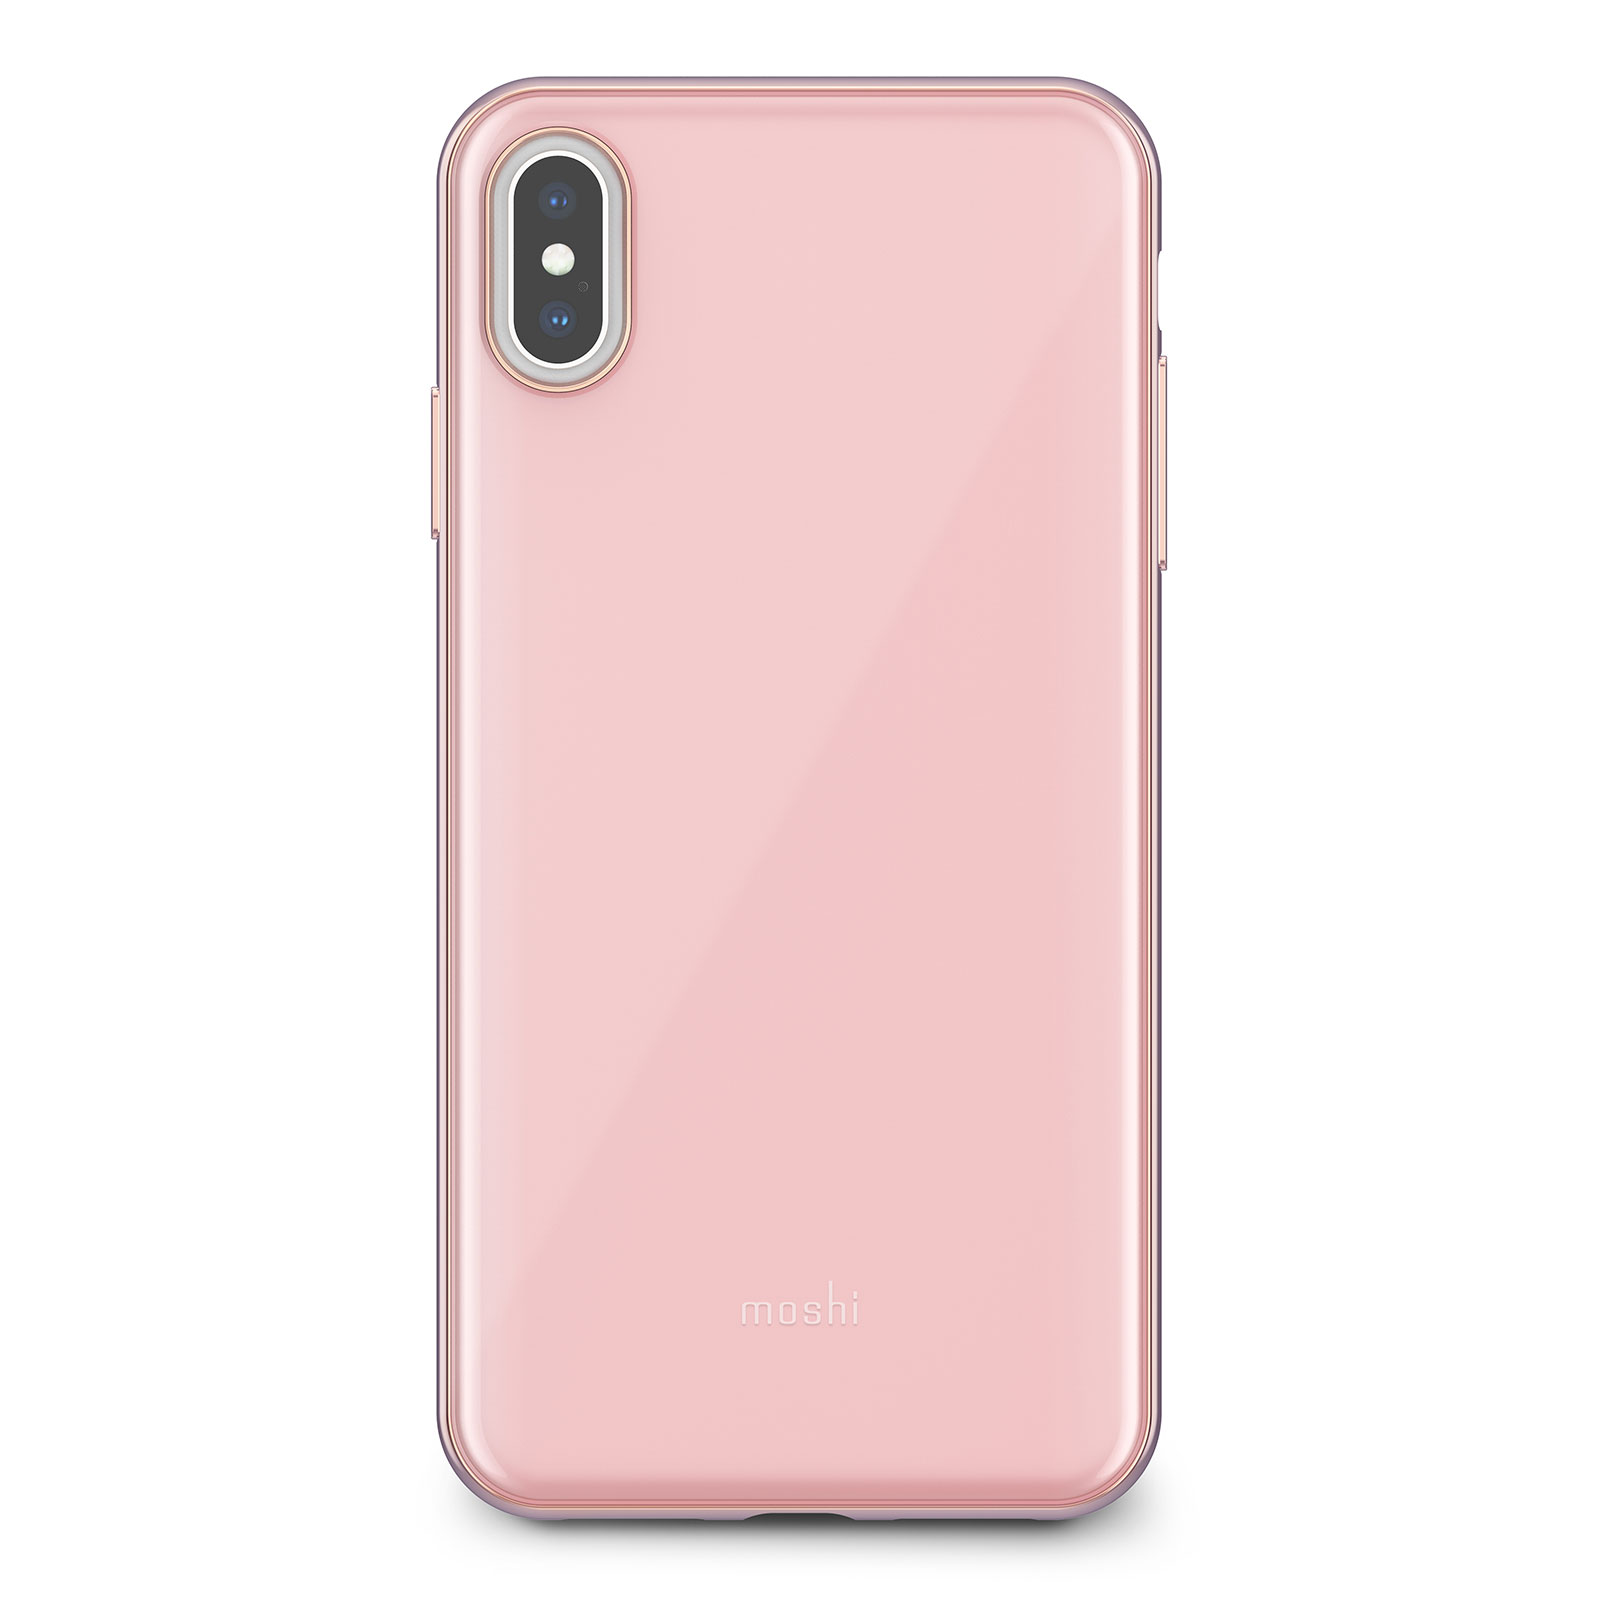 Клип-кейс Moshi iGlaze для iPhone XS Max Taupe Pink накладка moshi iglaze для iphone xs max чёрный 99mo113002